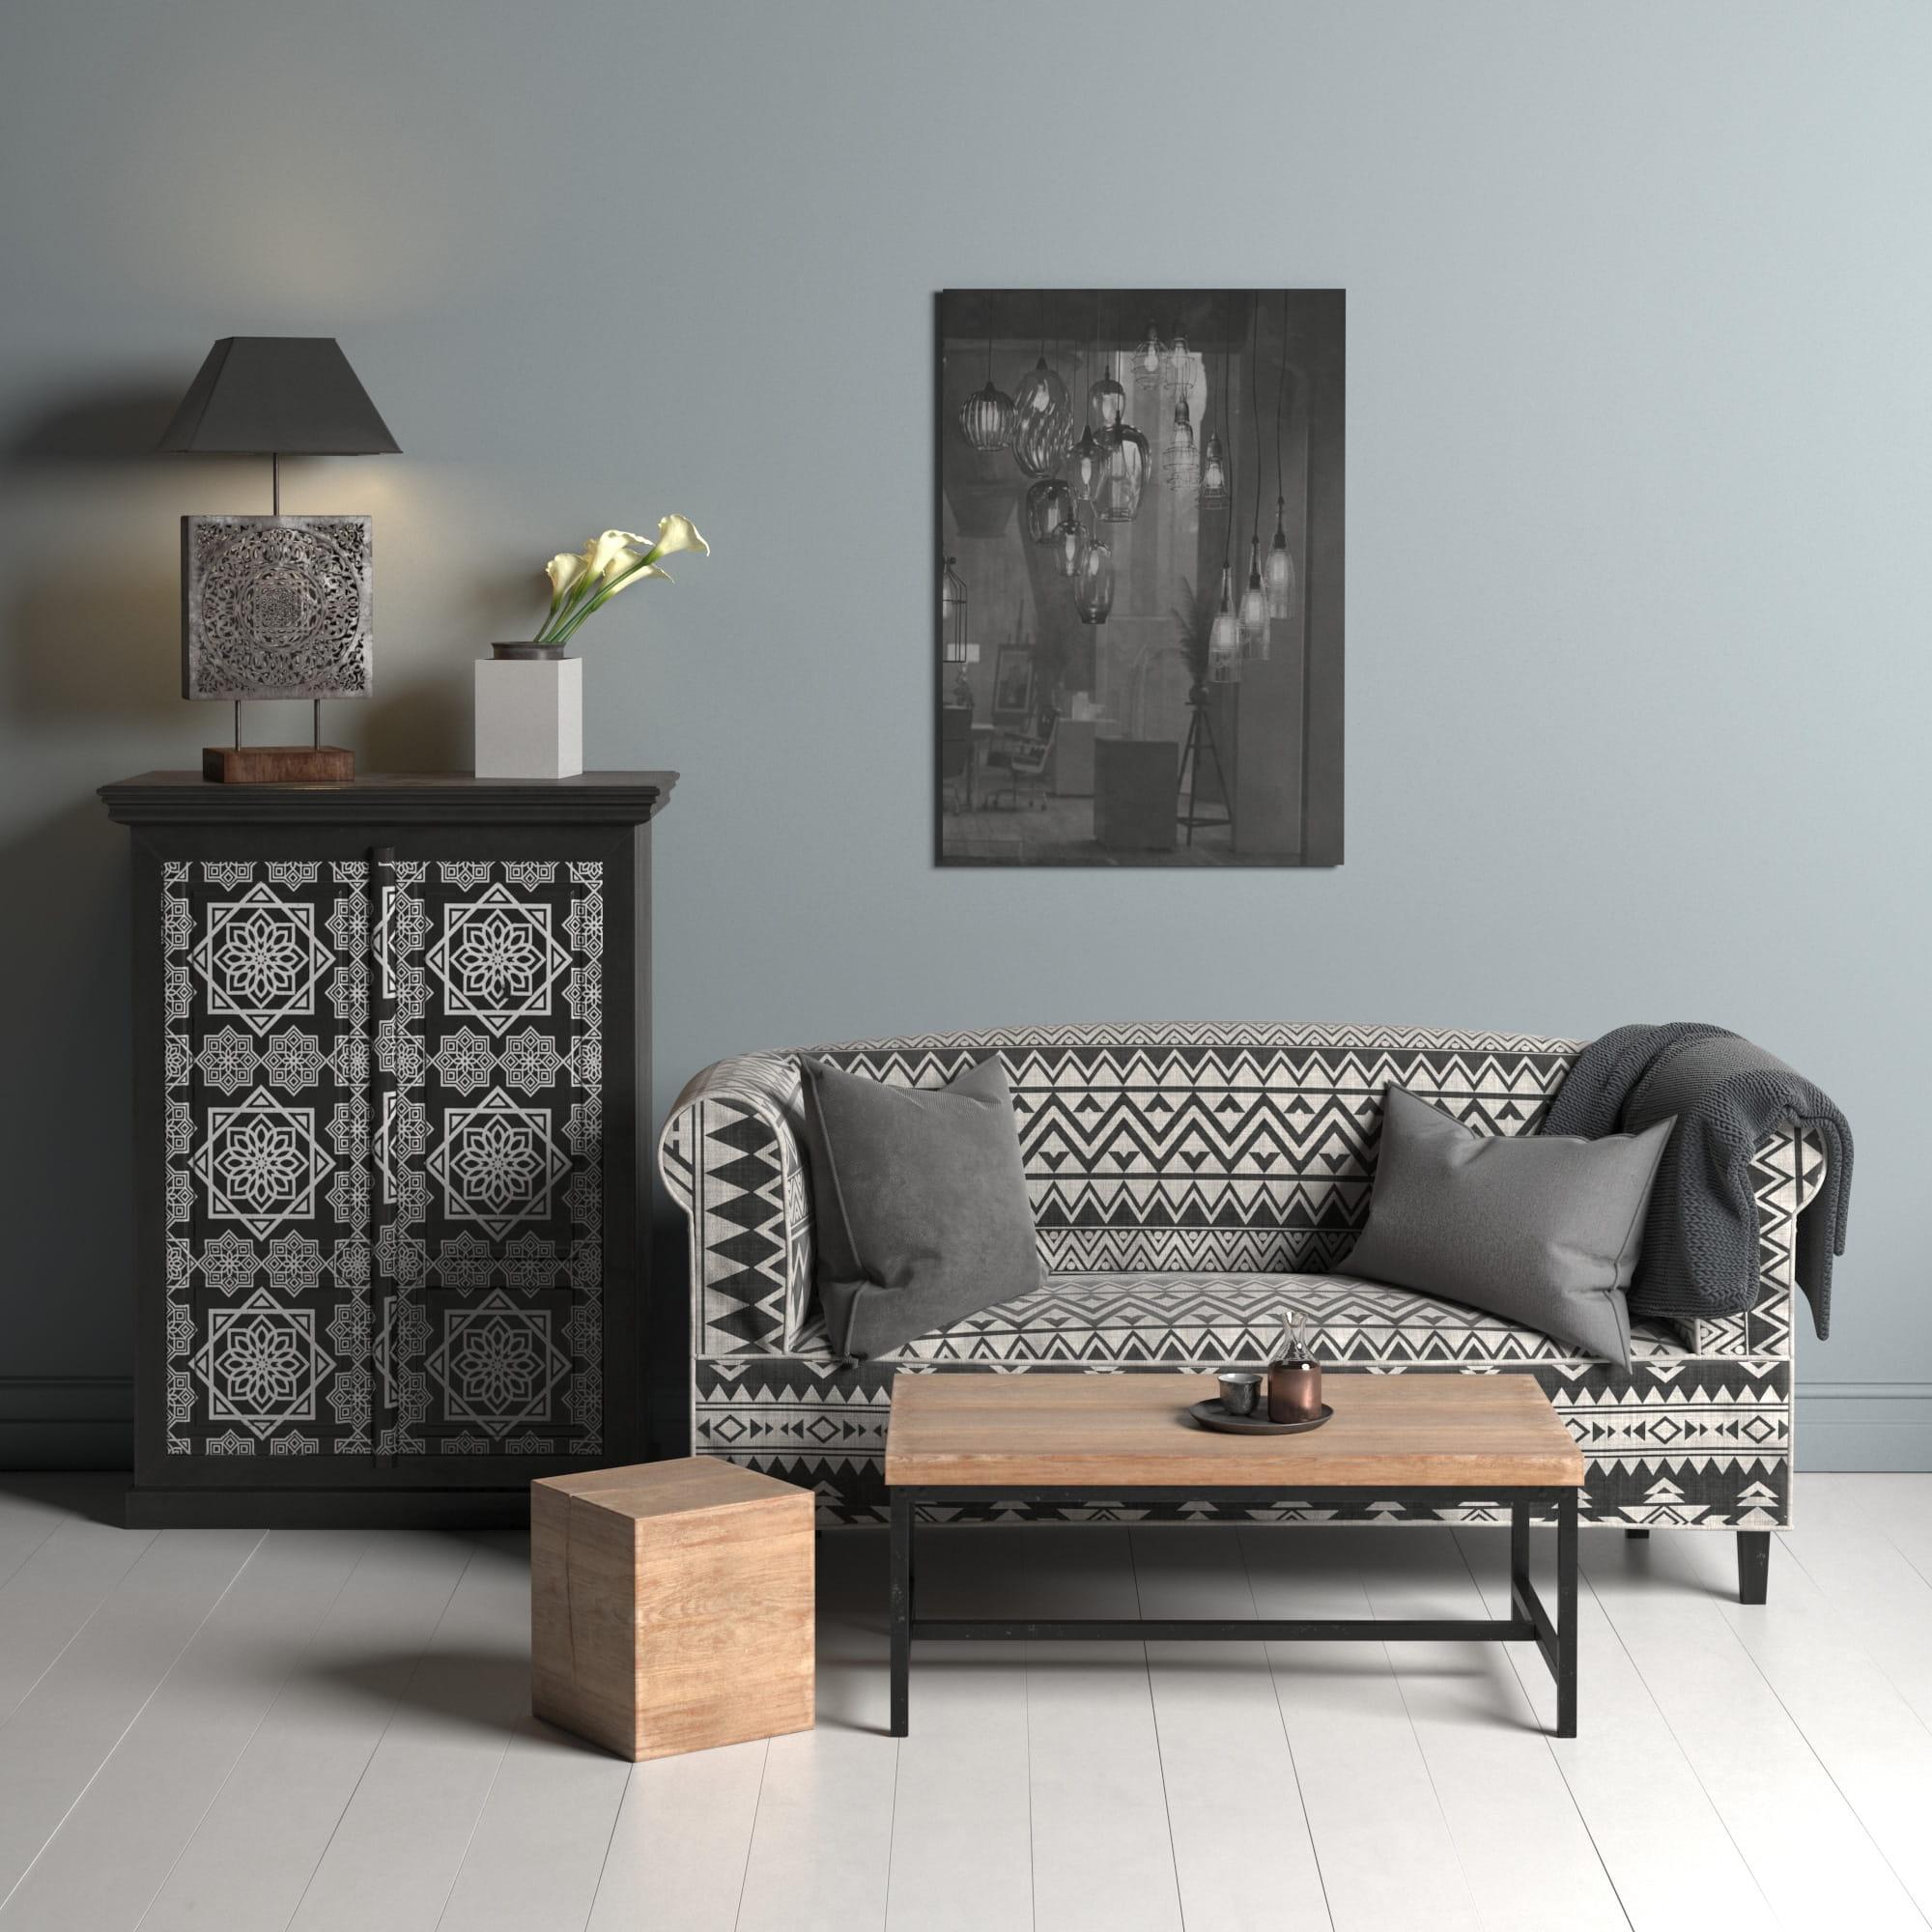 furniture set 13 AM225